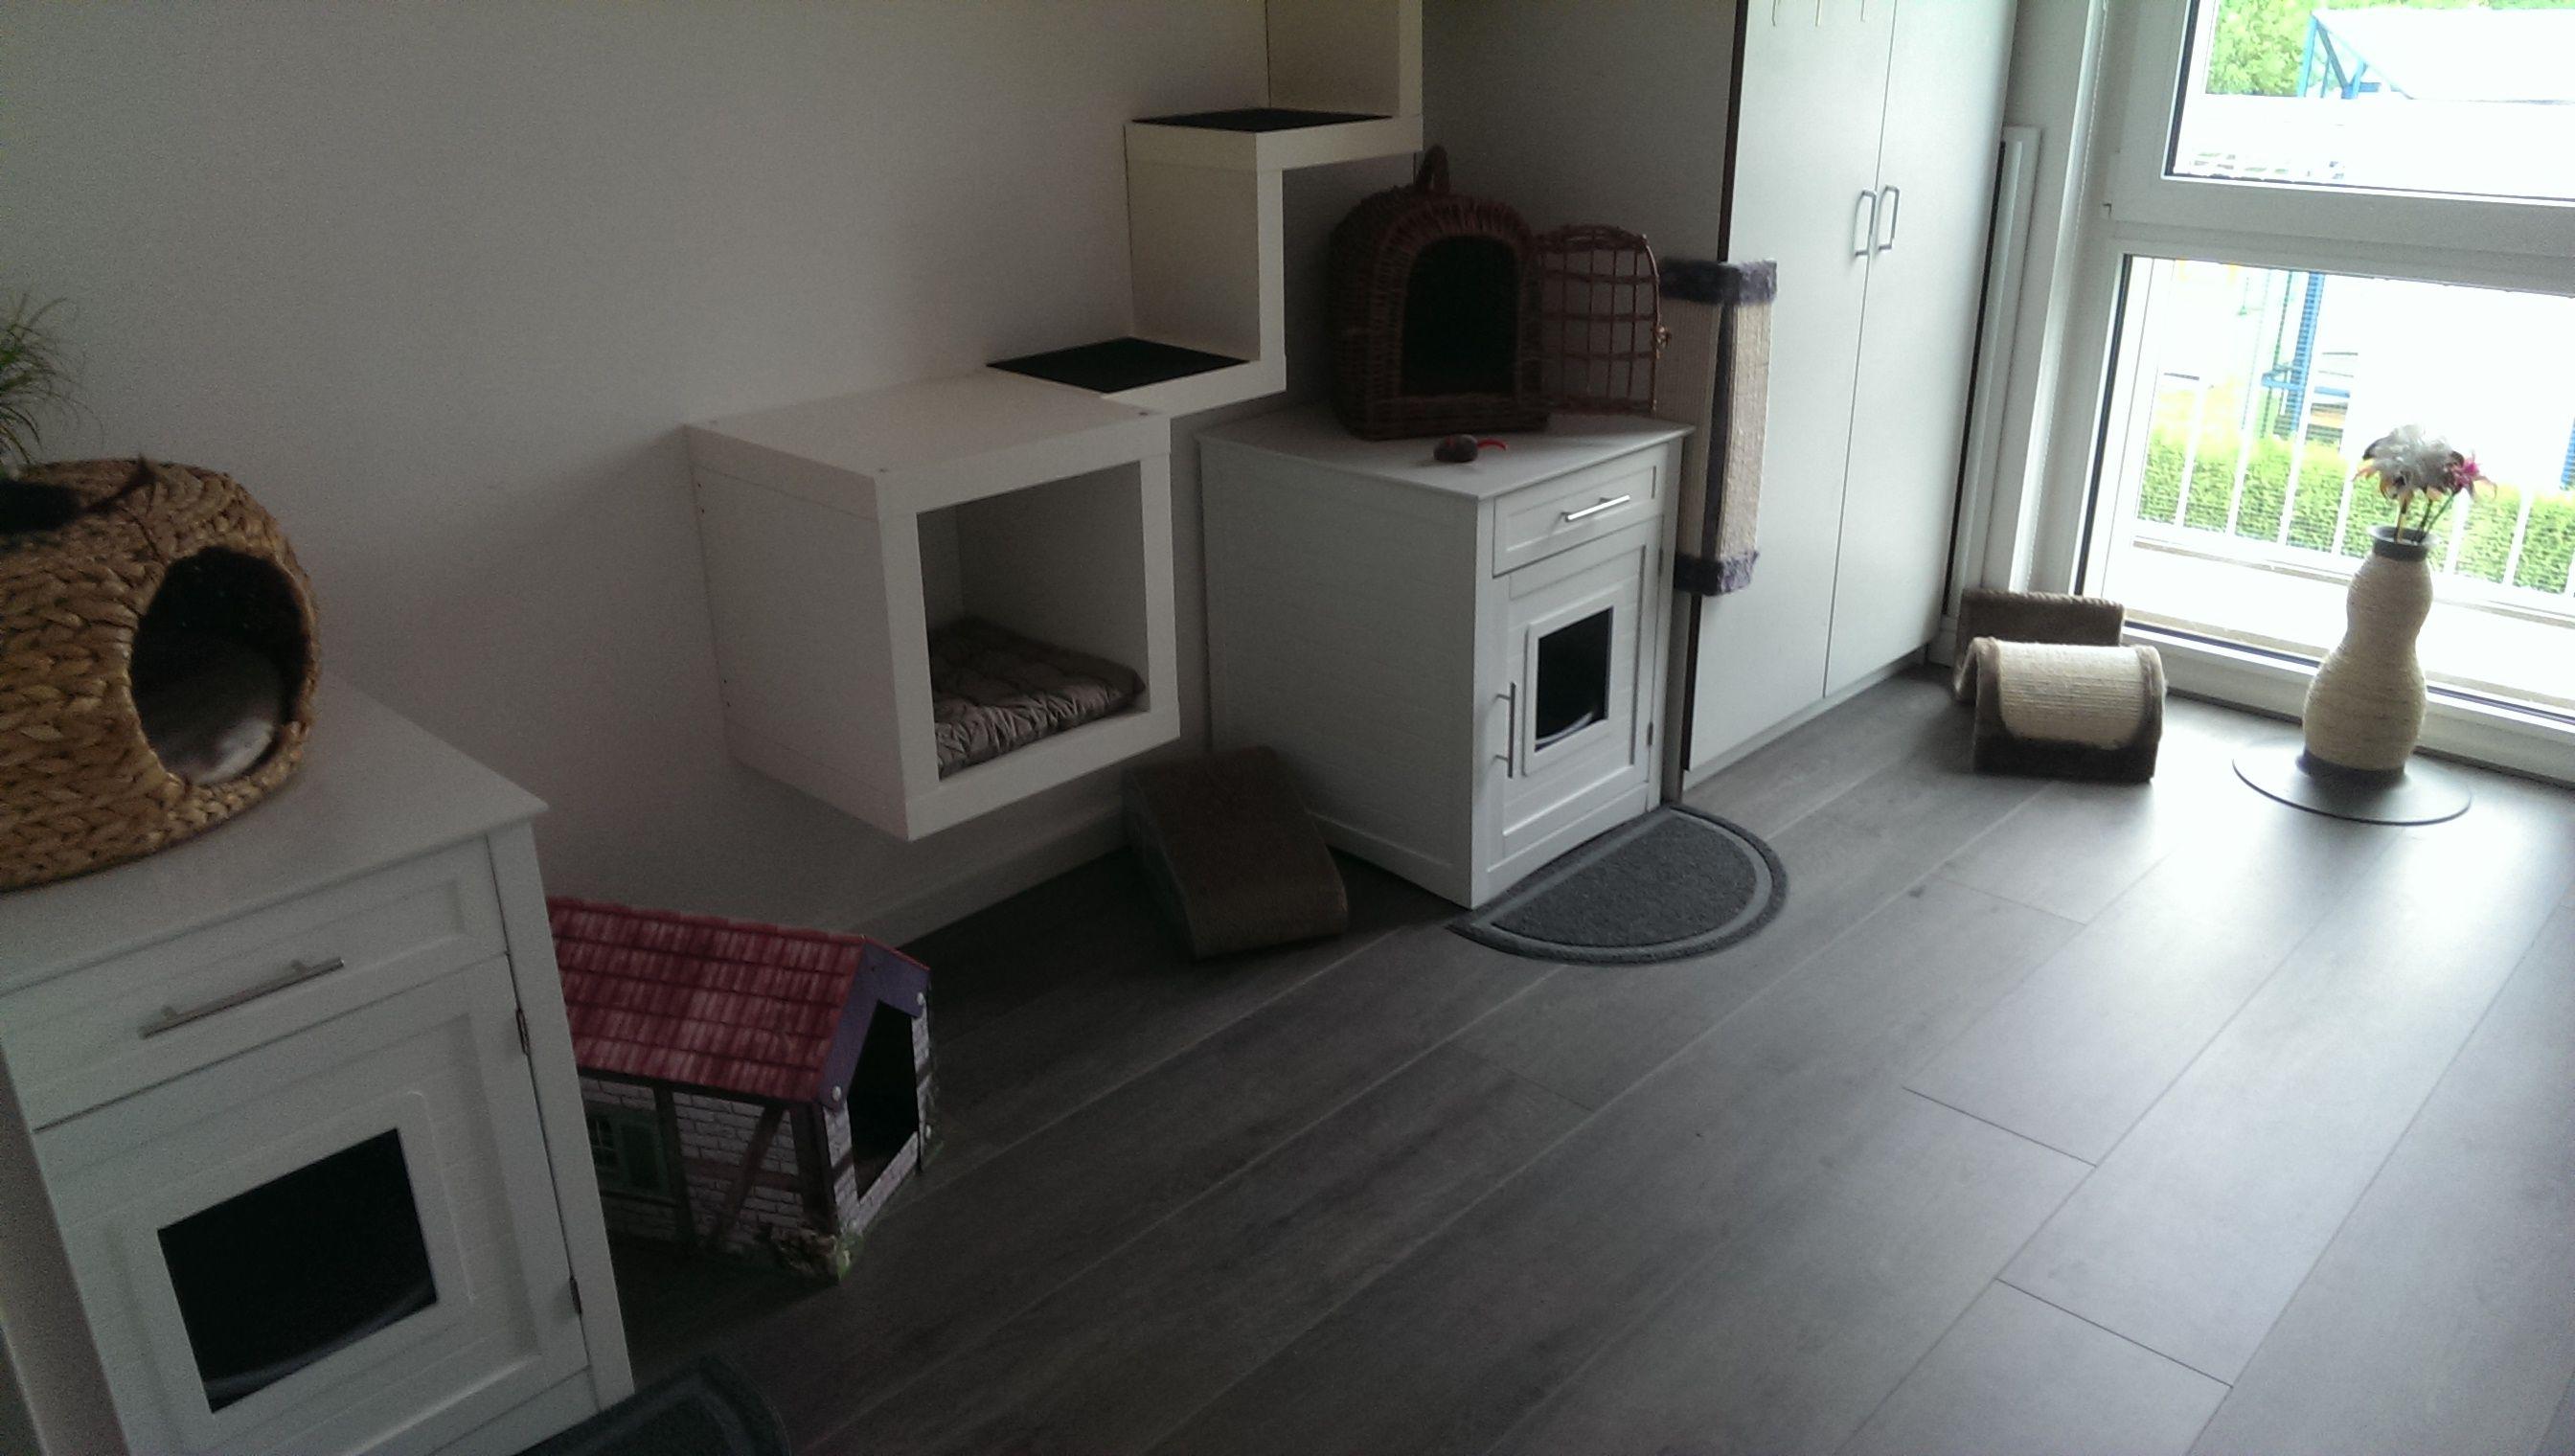 Kattenkamer #cats #kattenkamer #litterbox #kattenbak #hiding #kat #catsroom #cattoys